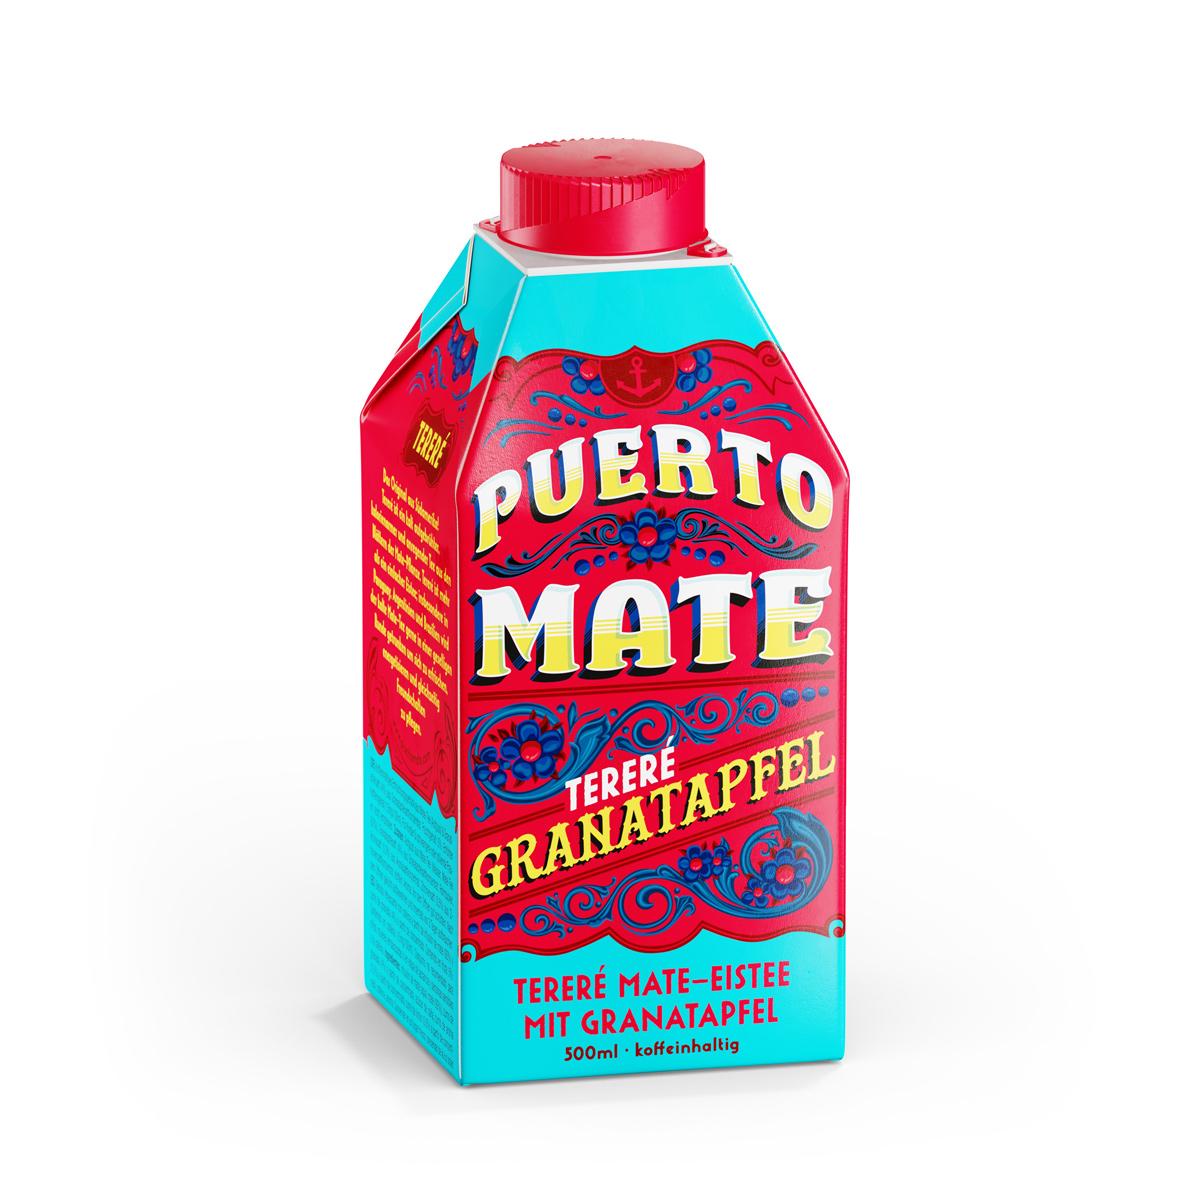 Puerto Mate - Pomegranate - 8 x 500ml Tetra-Pak